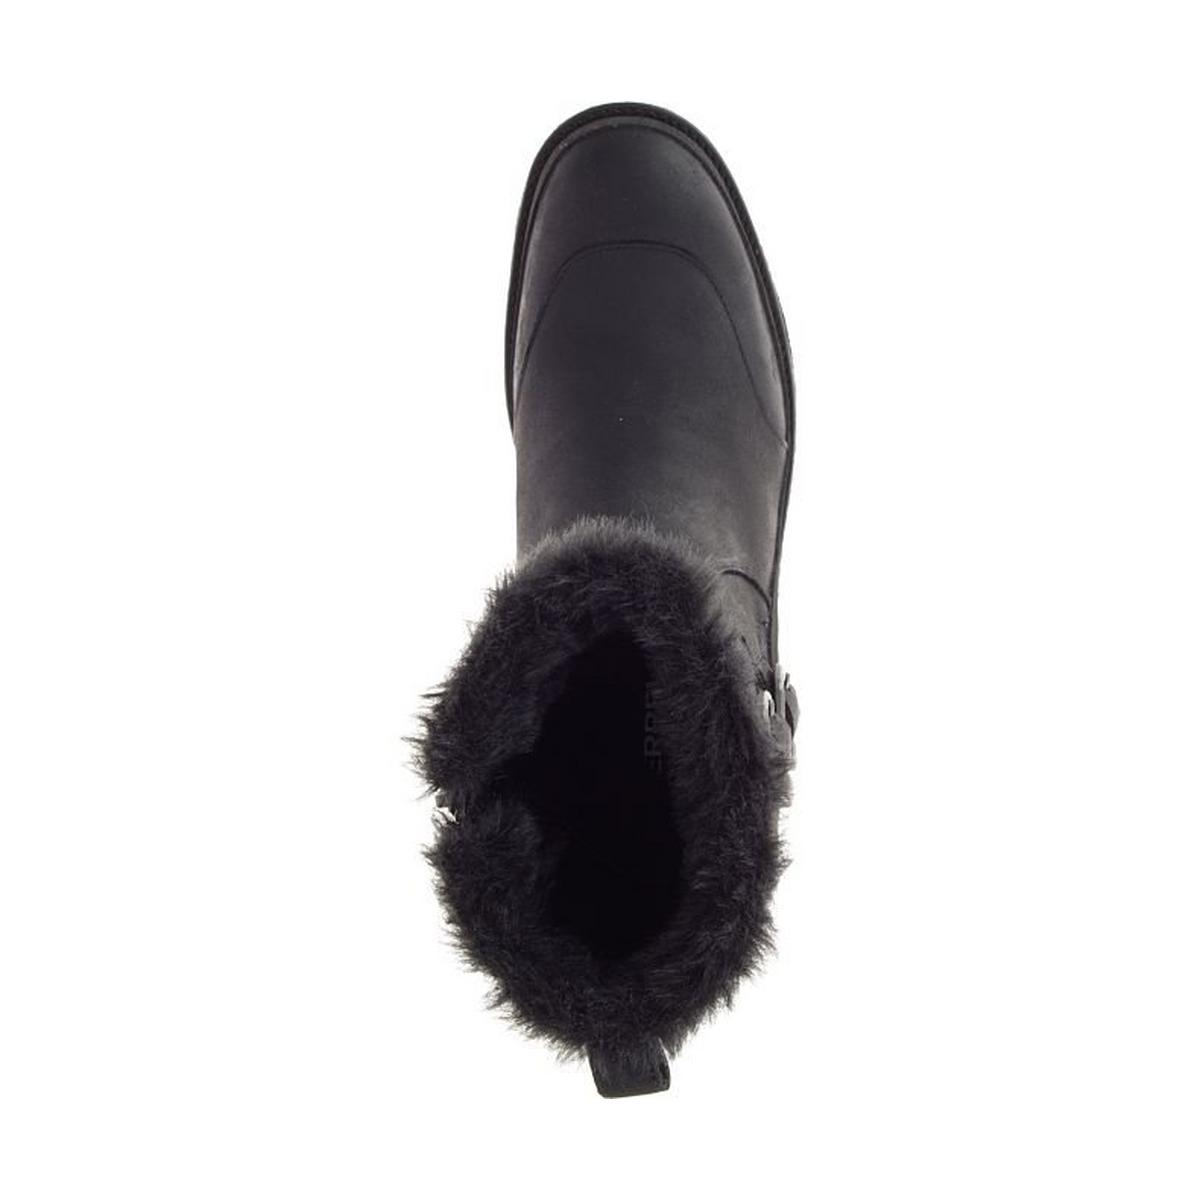 Merrell Women's Tremblant Ezra Buckle Boots